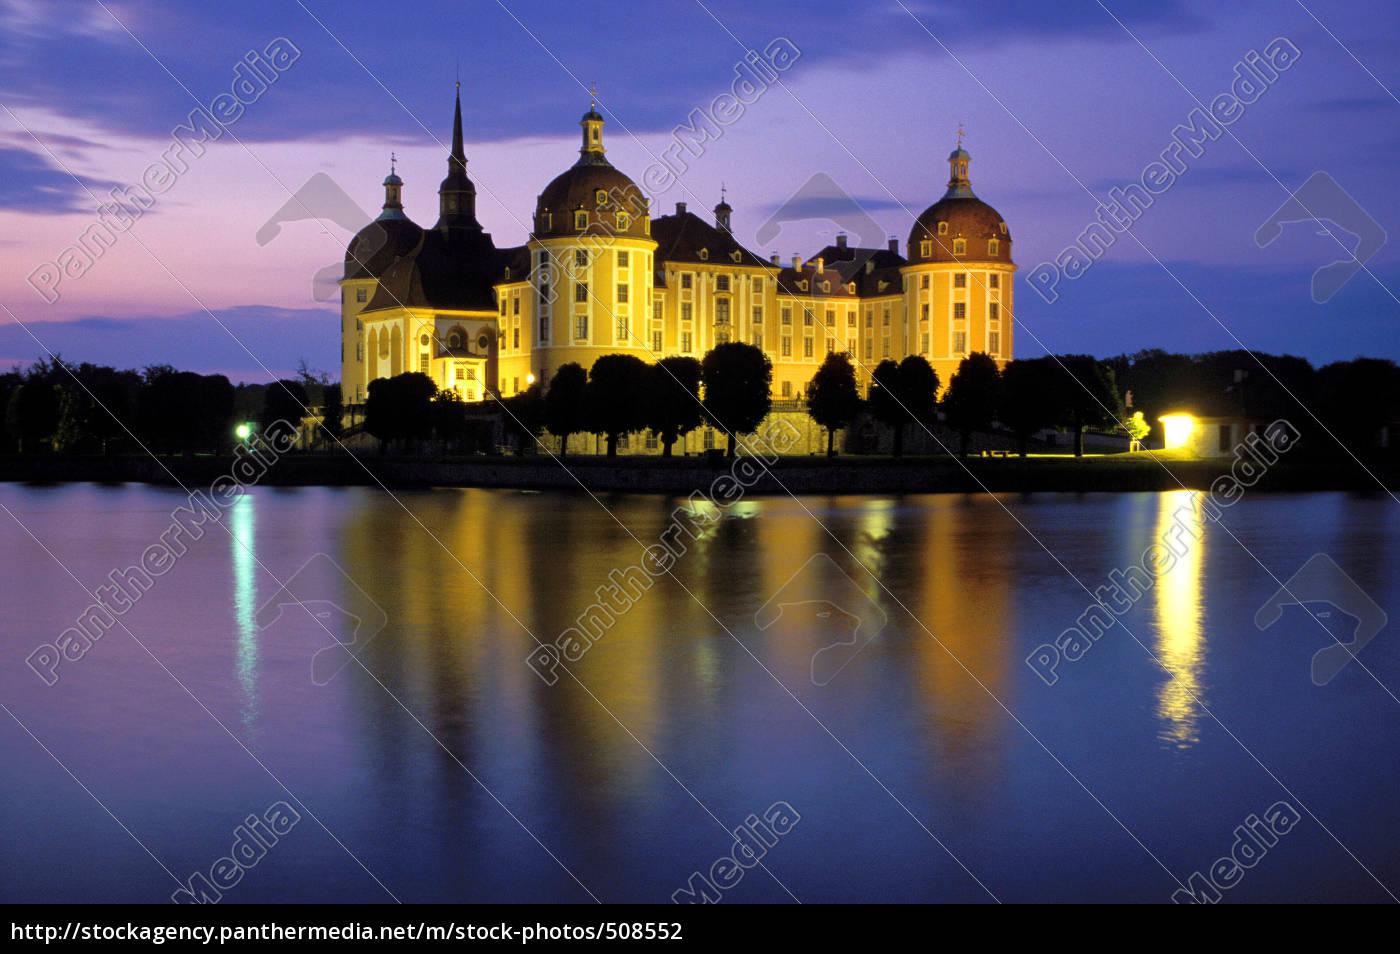 moritzburg, castle - 508552